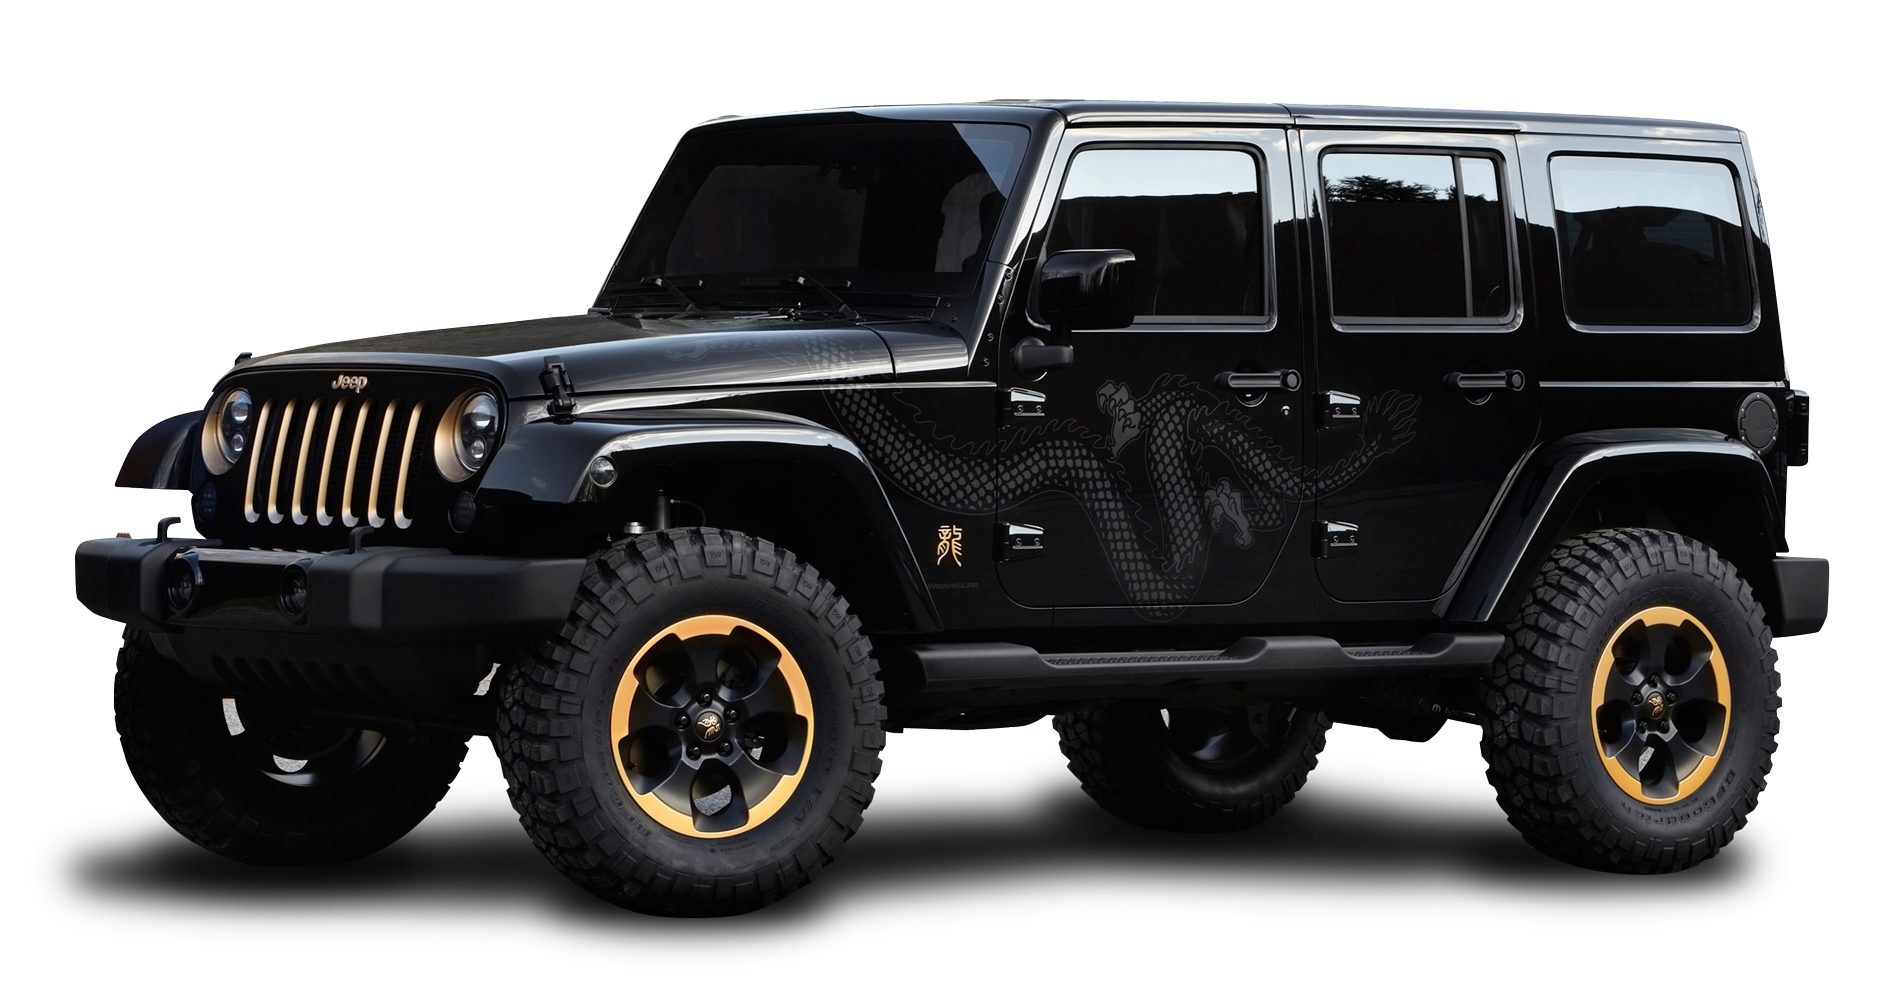 Black Jeep Wrangler Dragon Edition Car PNG Image.